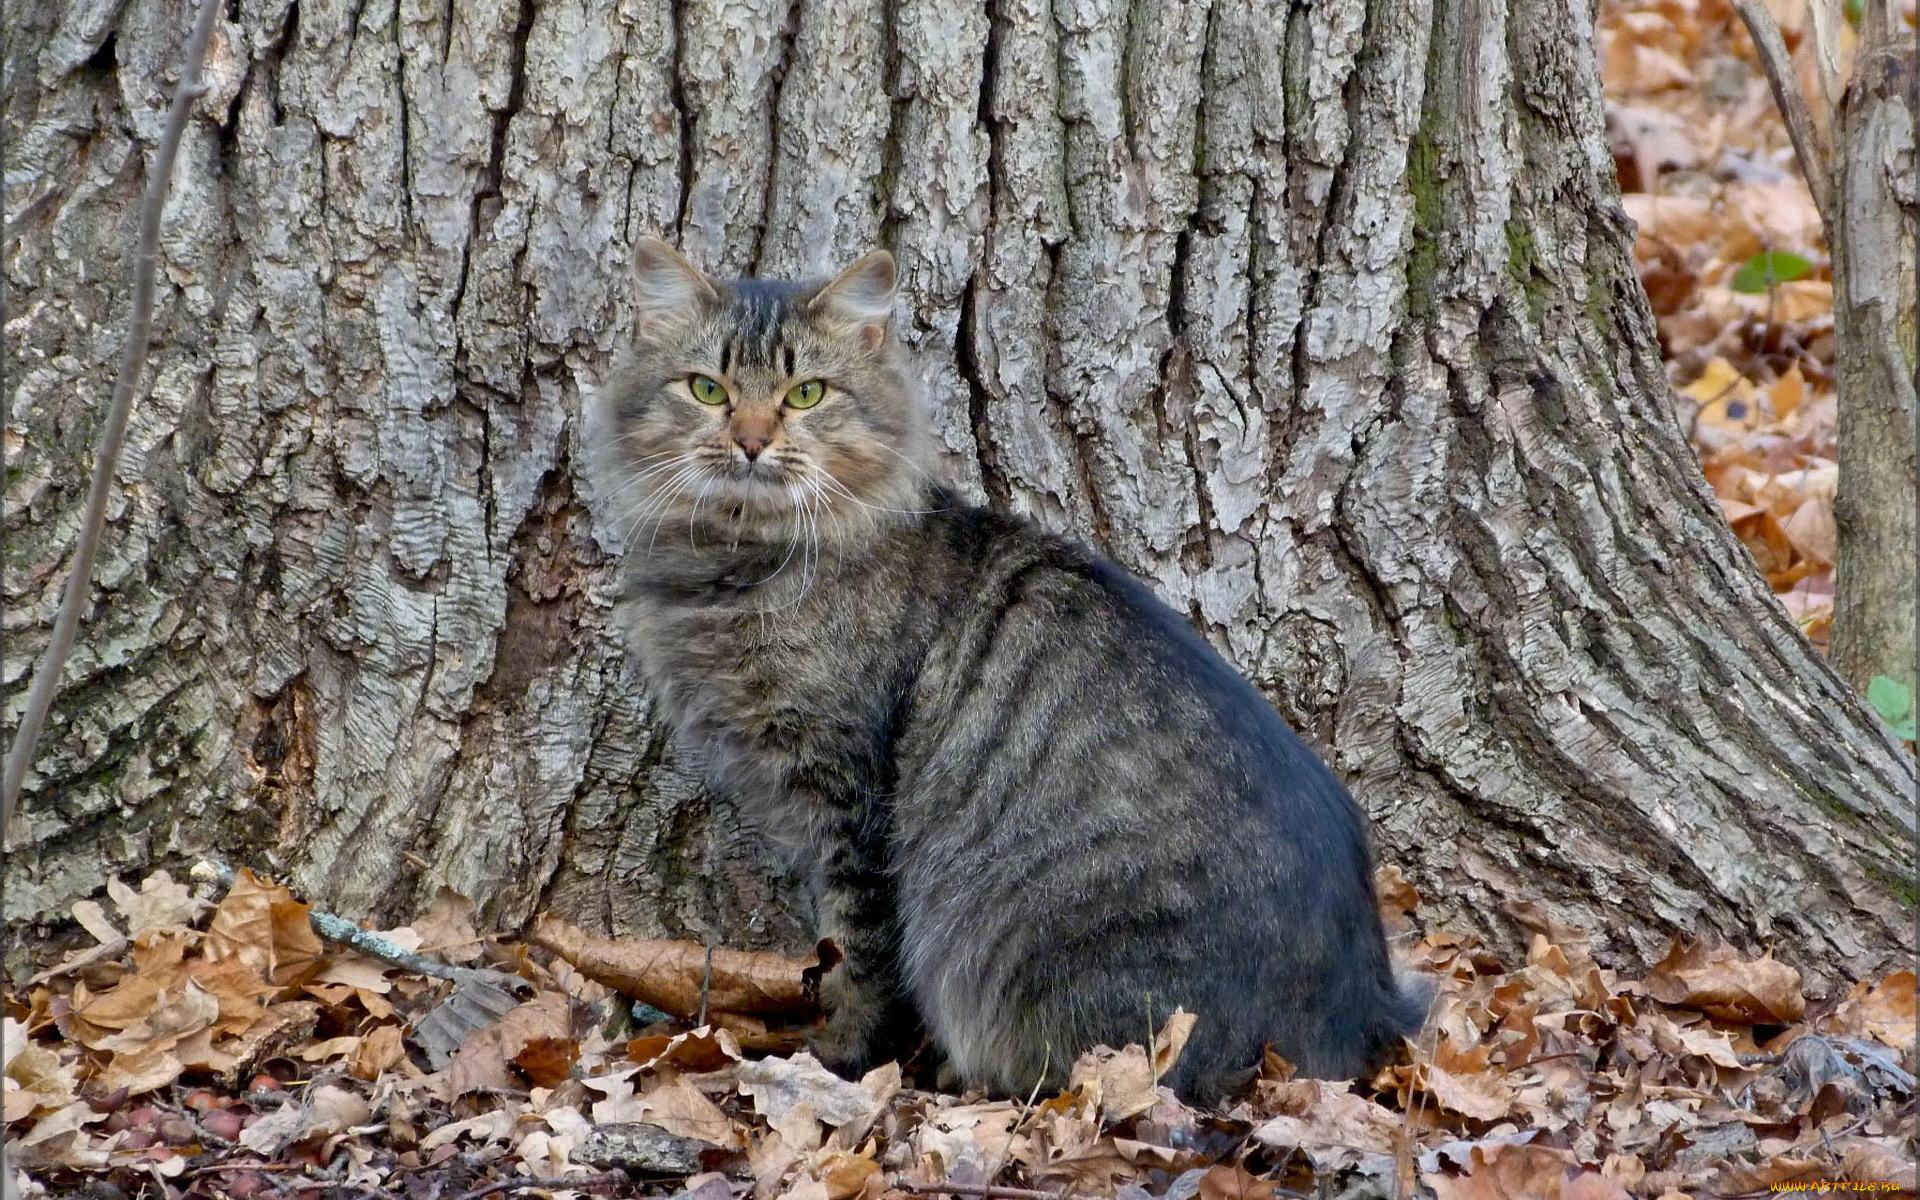 котик возле дерева без смс